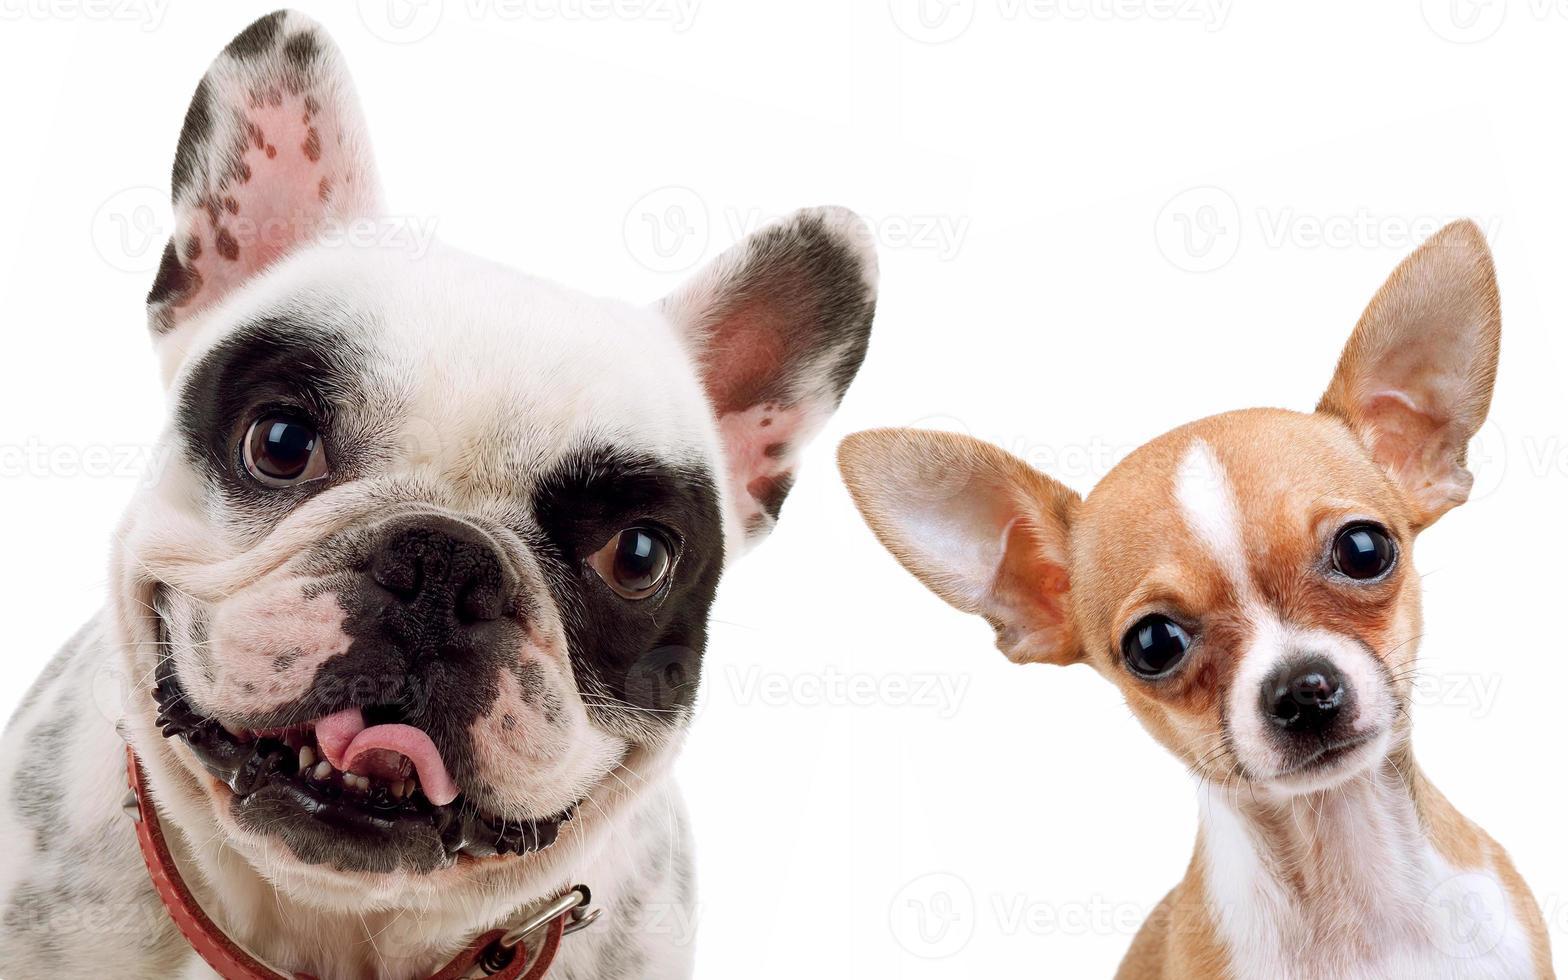 chihuahua and french bull dog photo